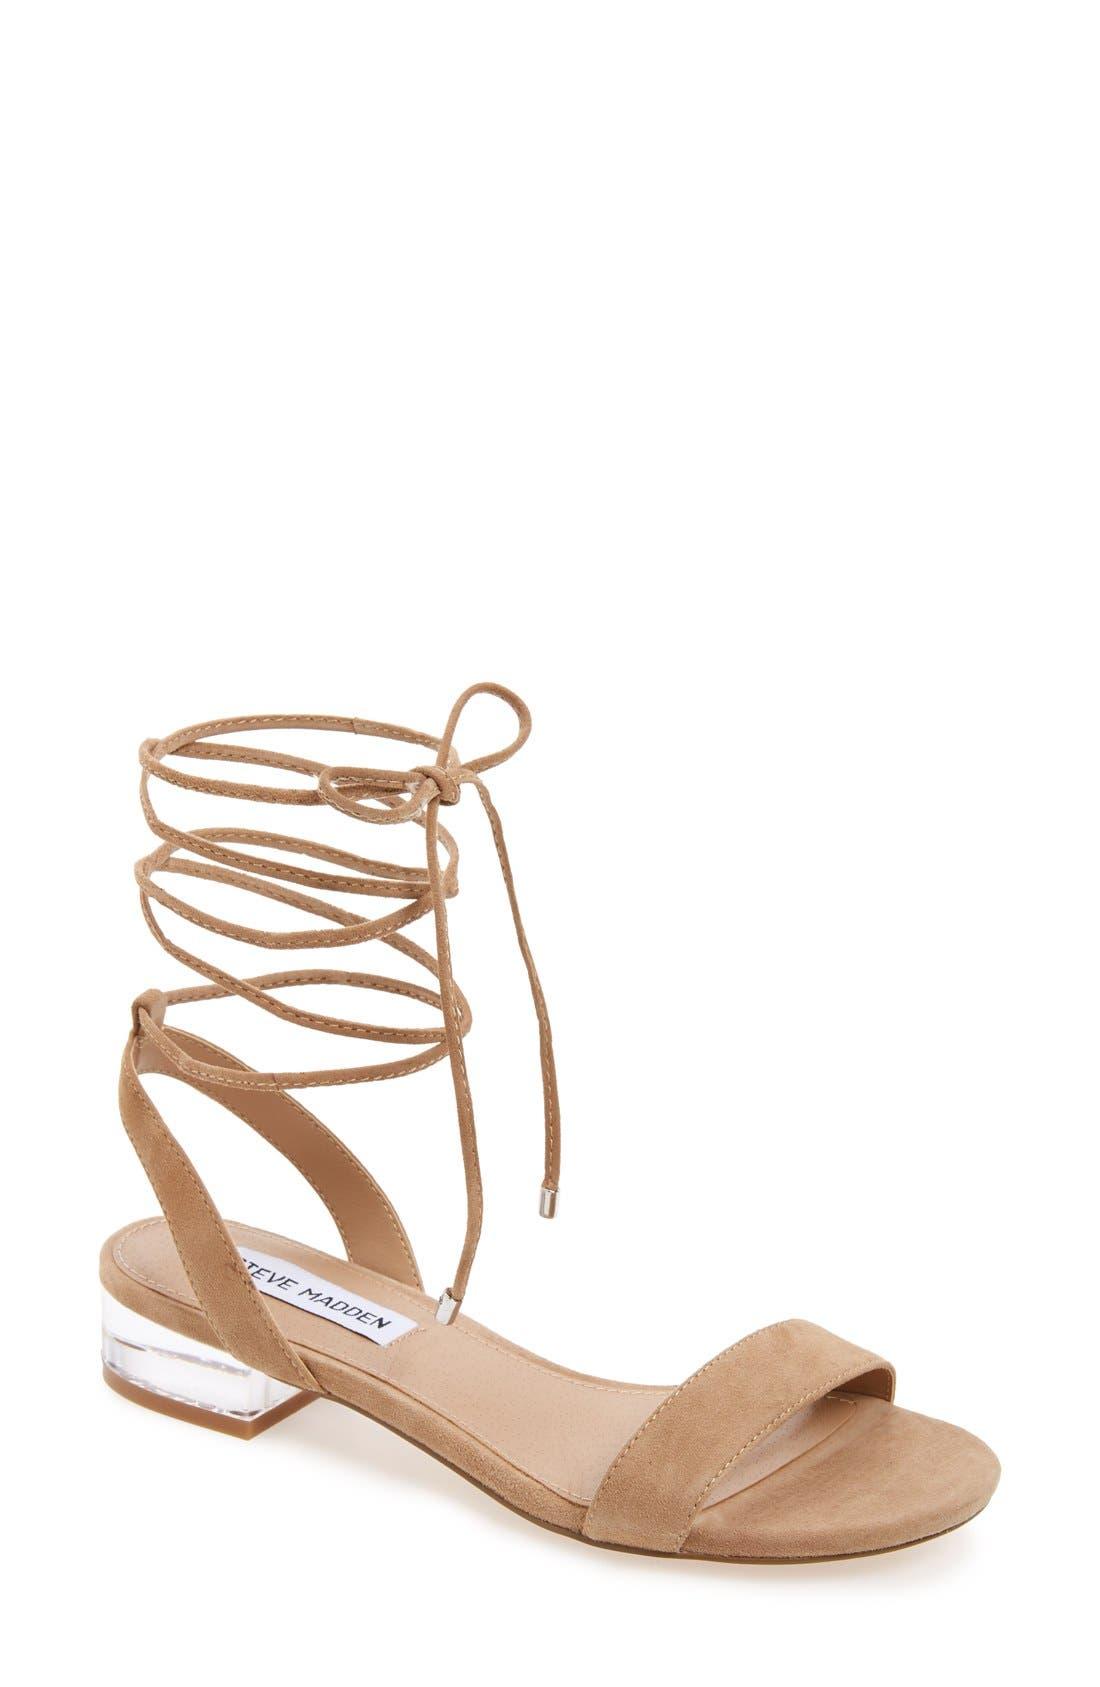 'Carolyn' Lace-Up Sandal,                             Main thumbnail 2, color,